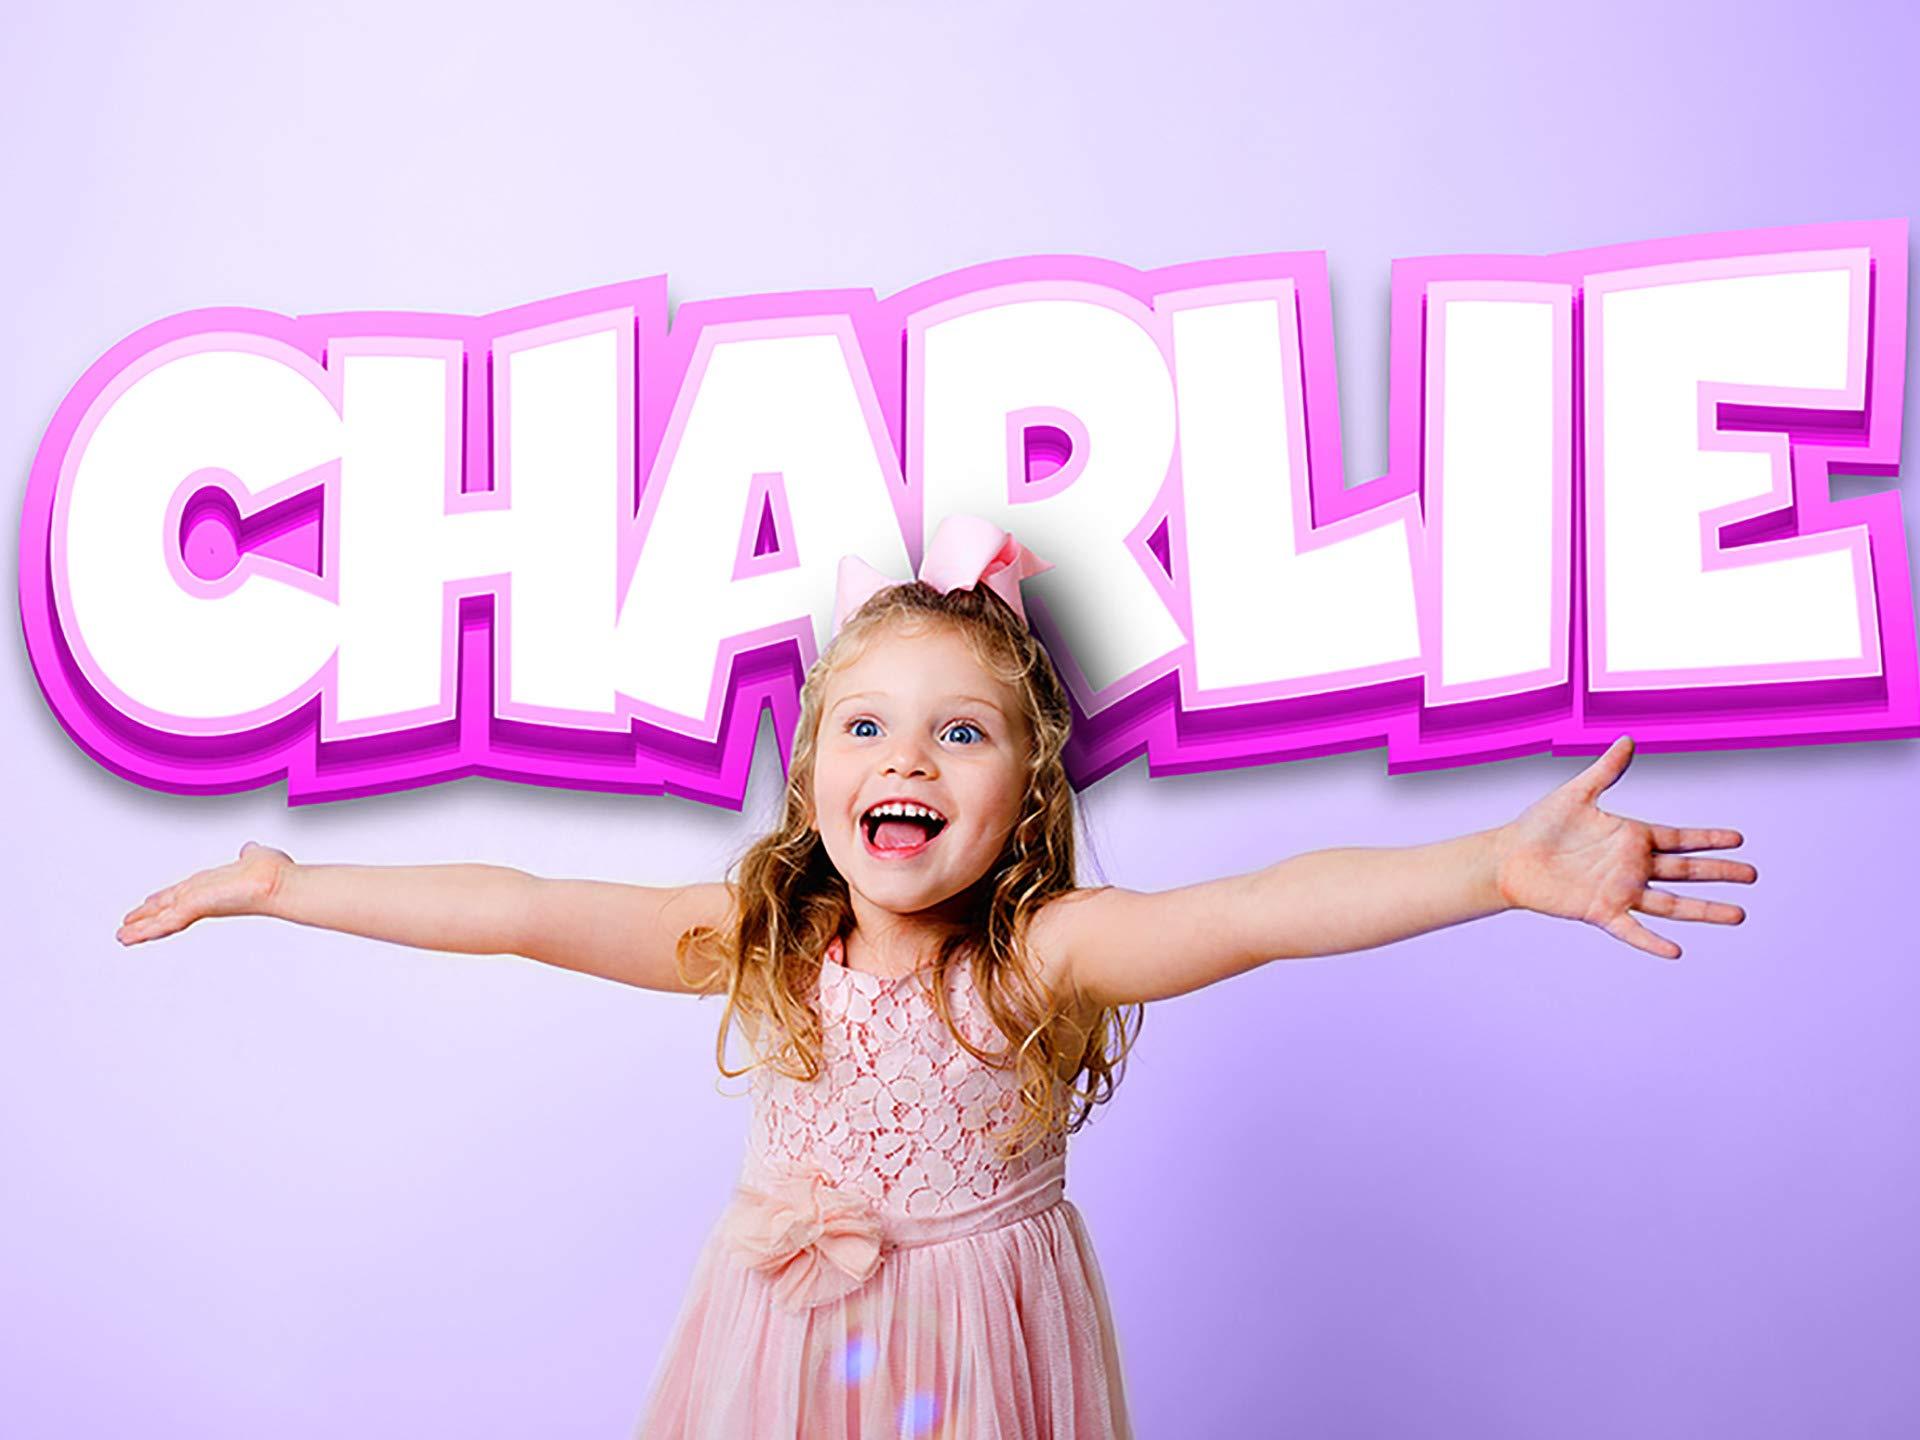 Charlie - Season 4